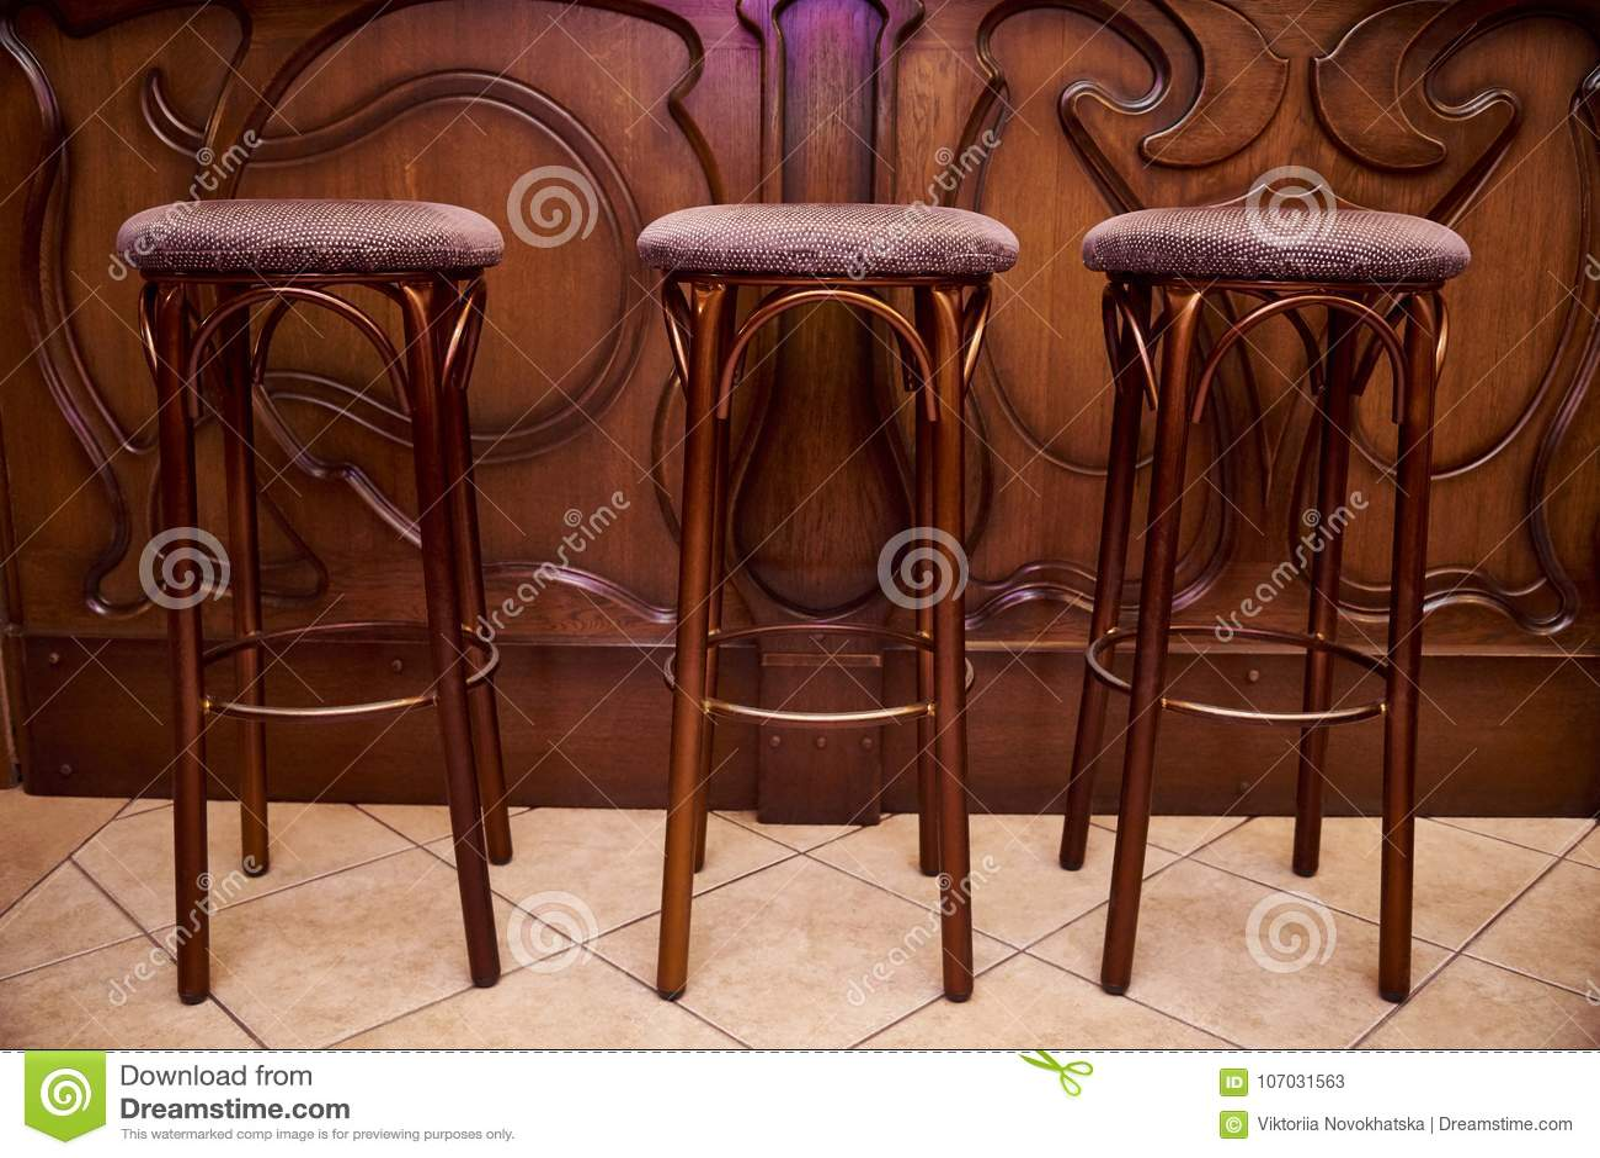 Alti sgabelli da bar di legno immagine stock immagine di